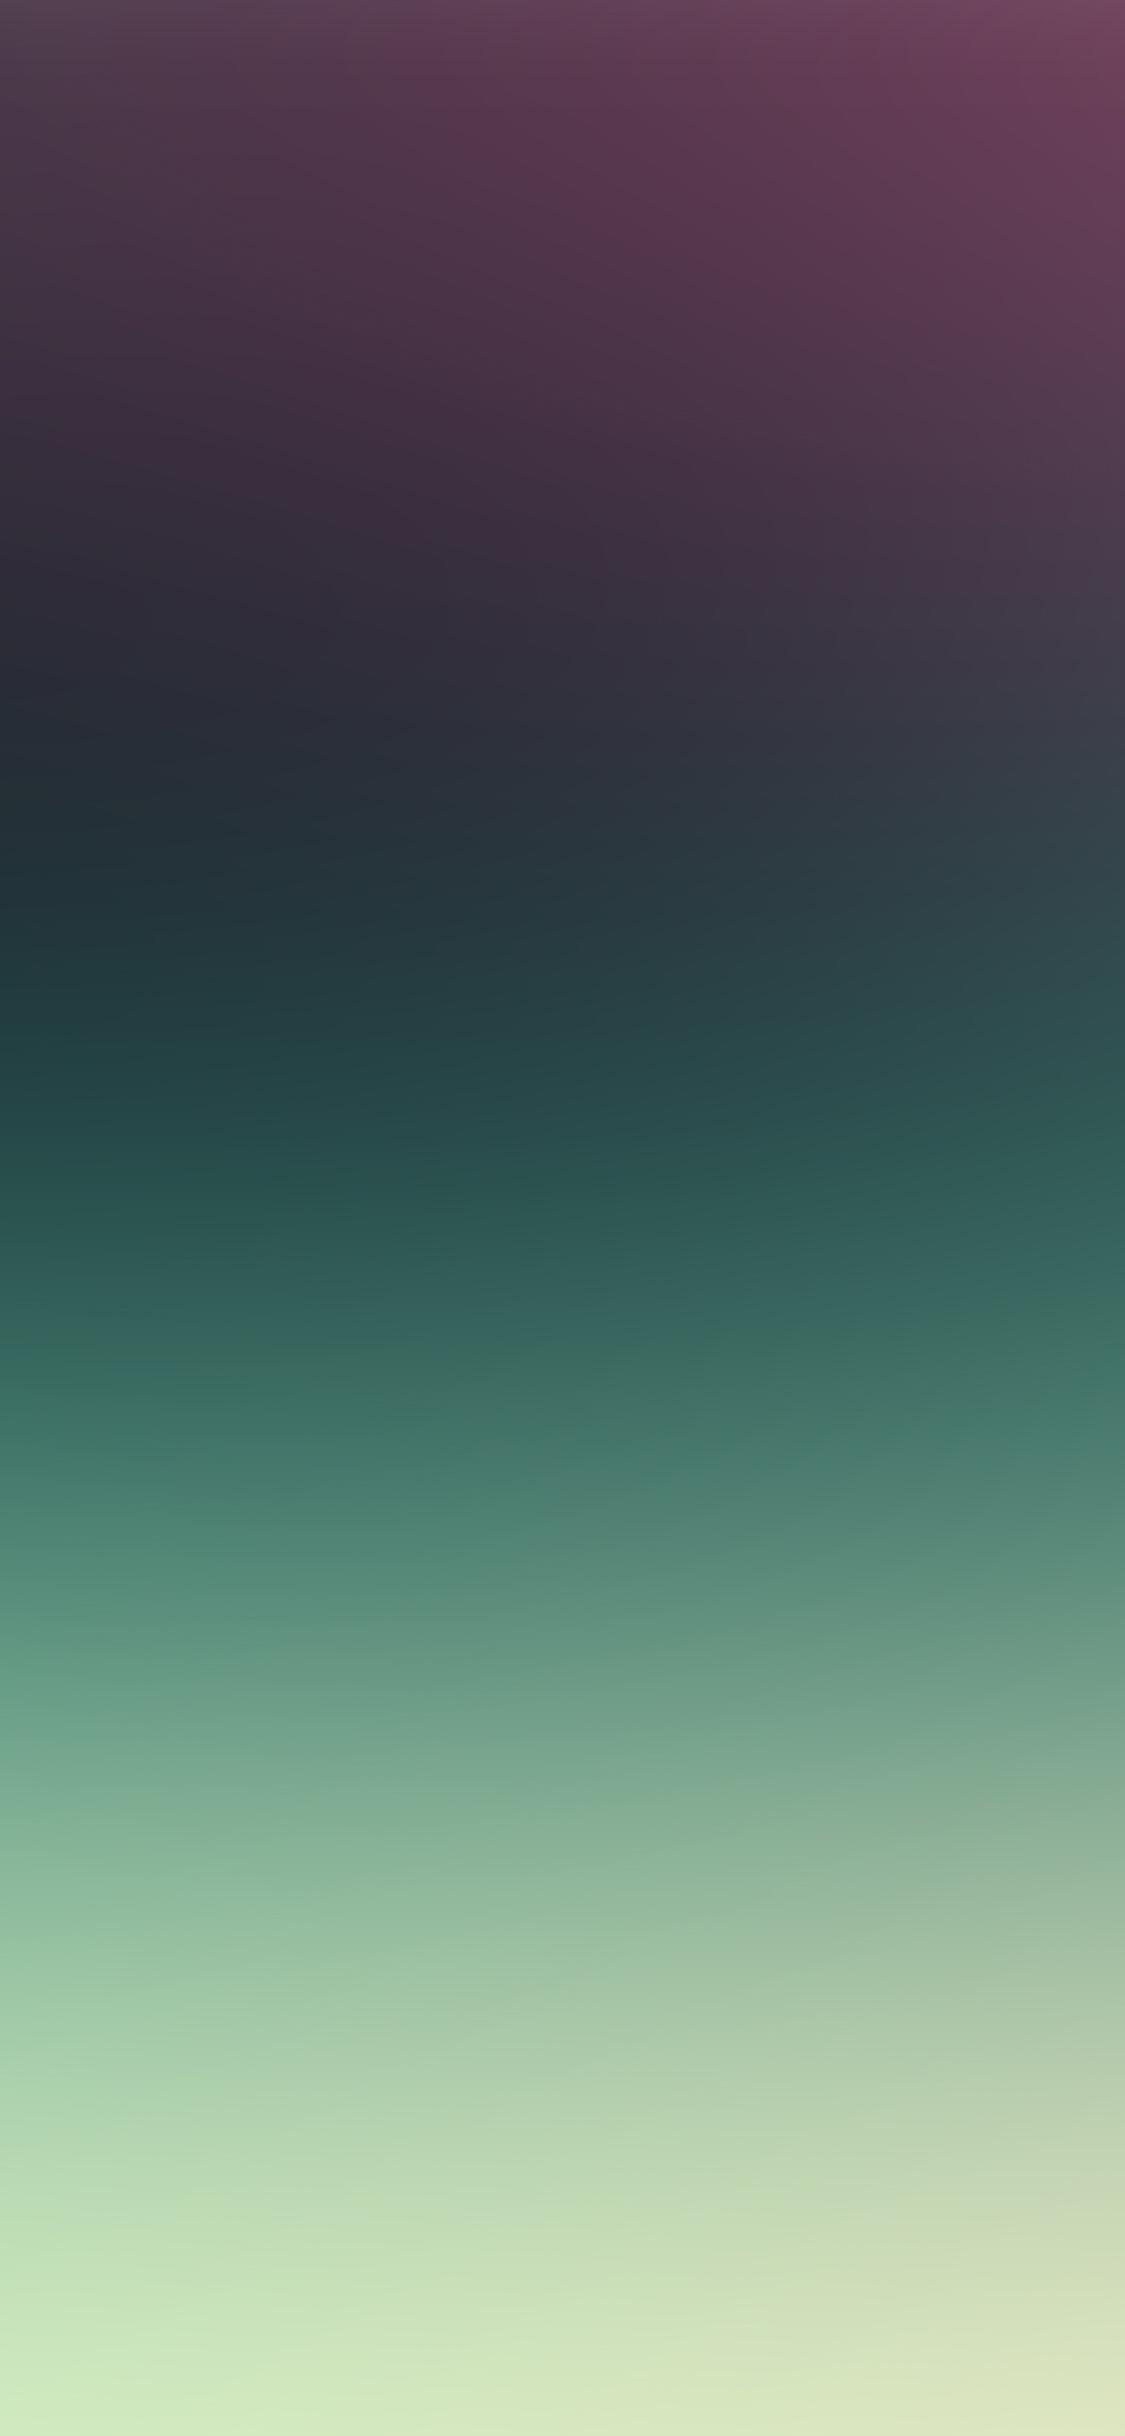 iPhoneXpapers.com-Apple-iPhone-wallpaper-sj81-purple-green-night-gradation-blur